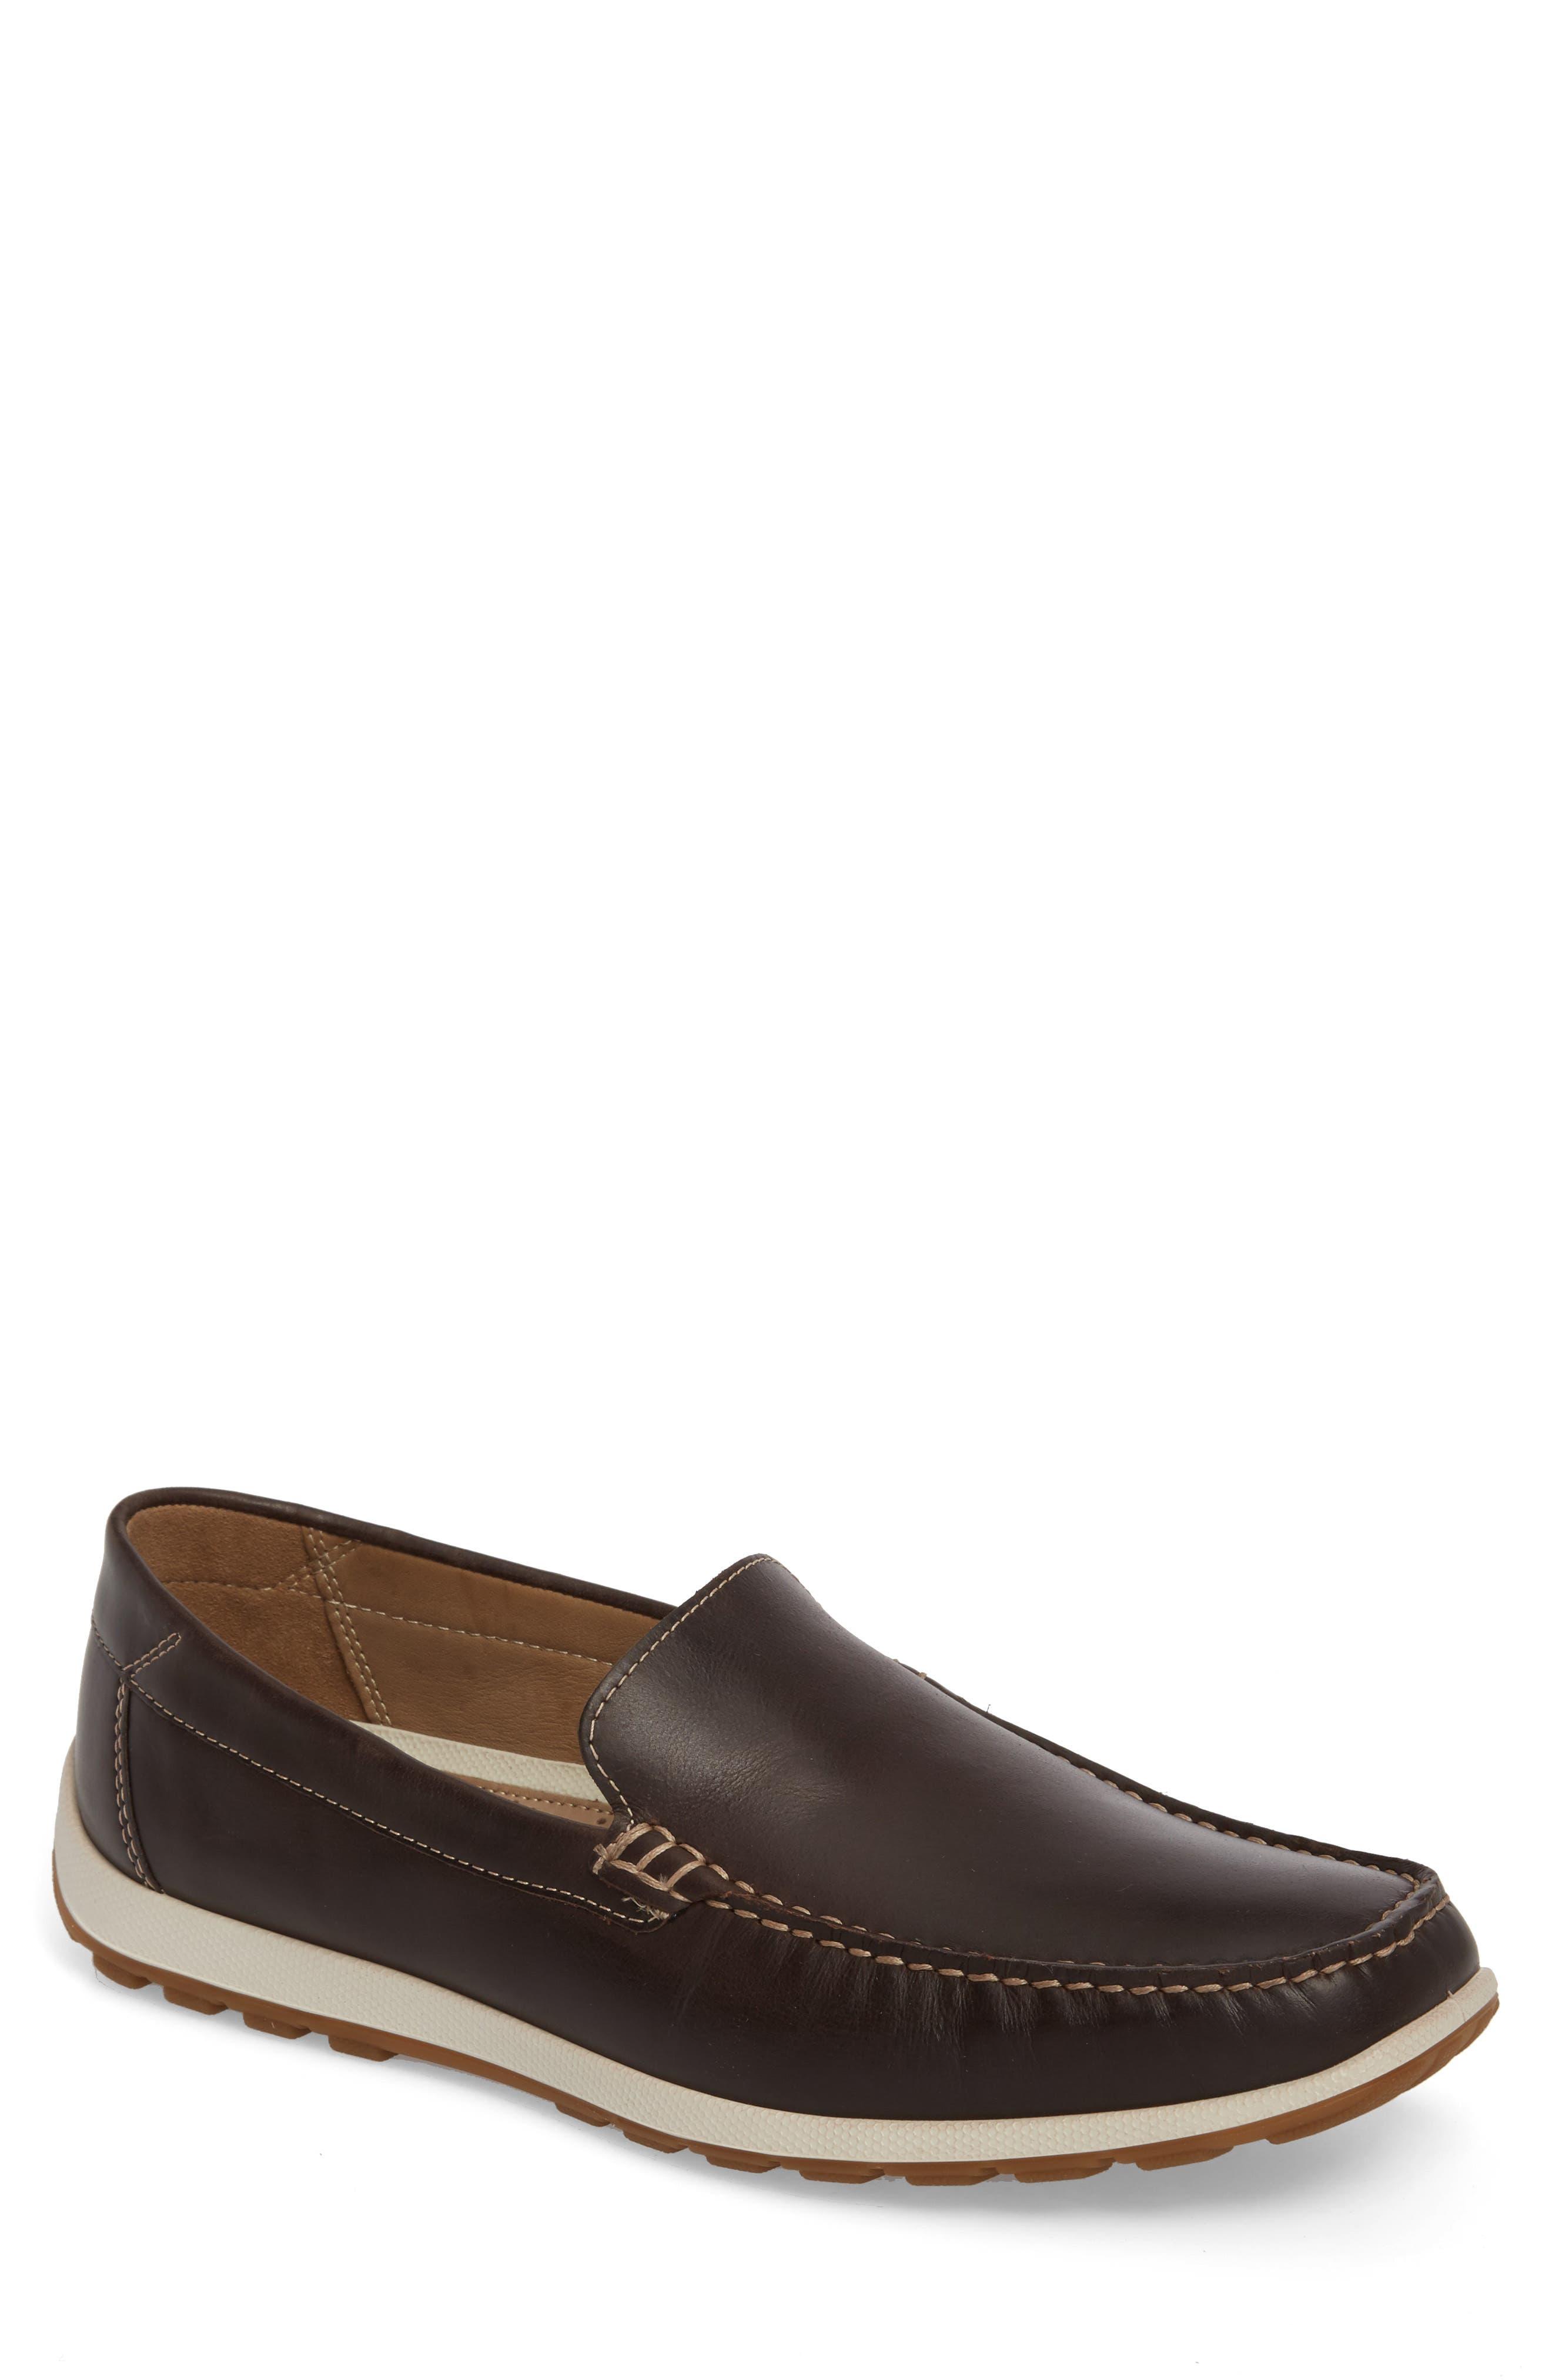 Dip Moc Toe Driving Loafer,                         Main,                         color, Mocha Leather